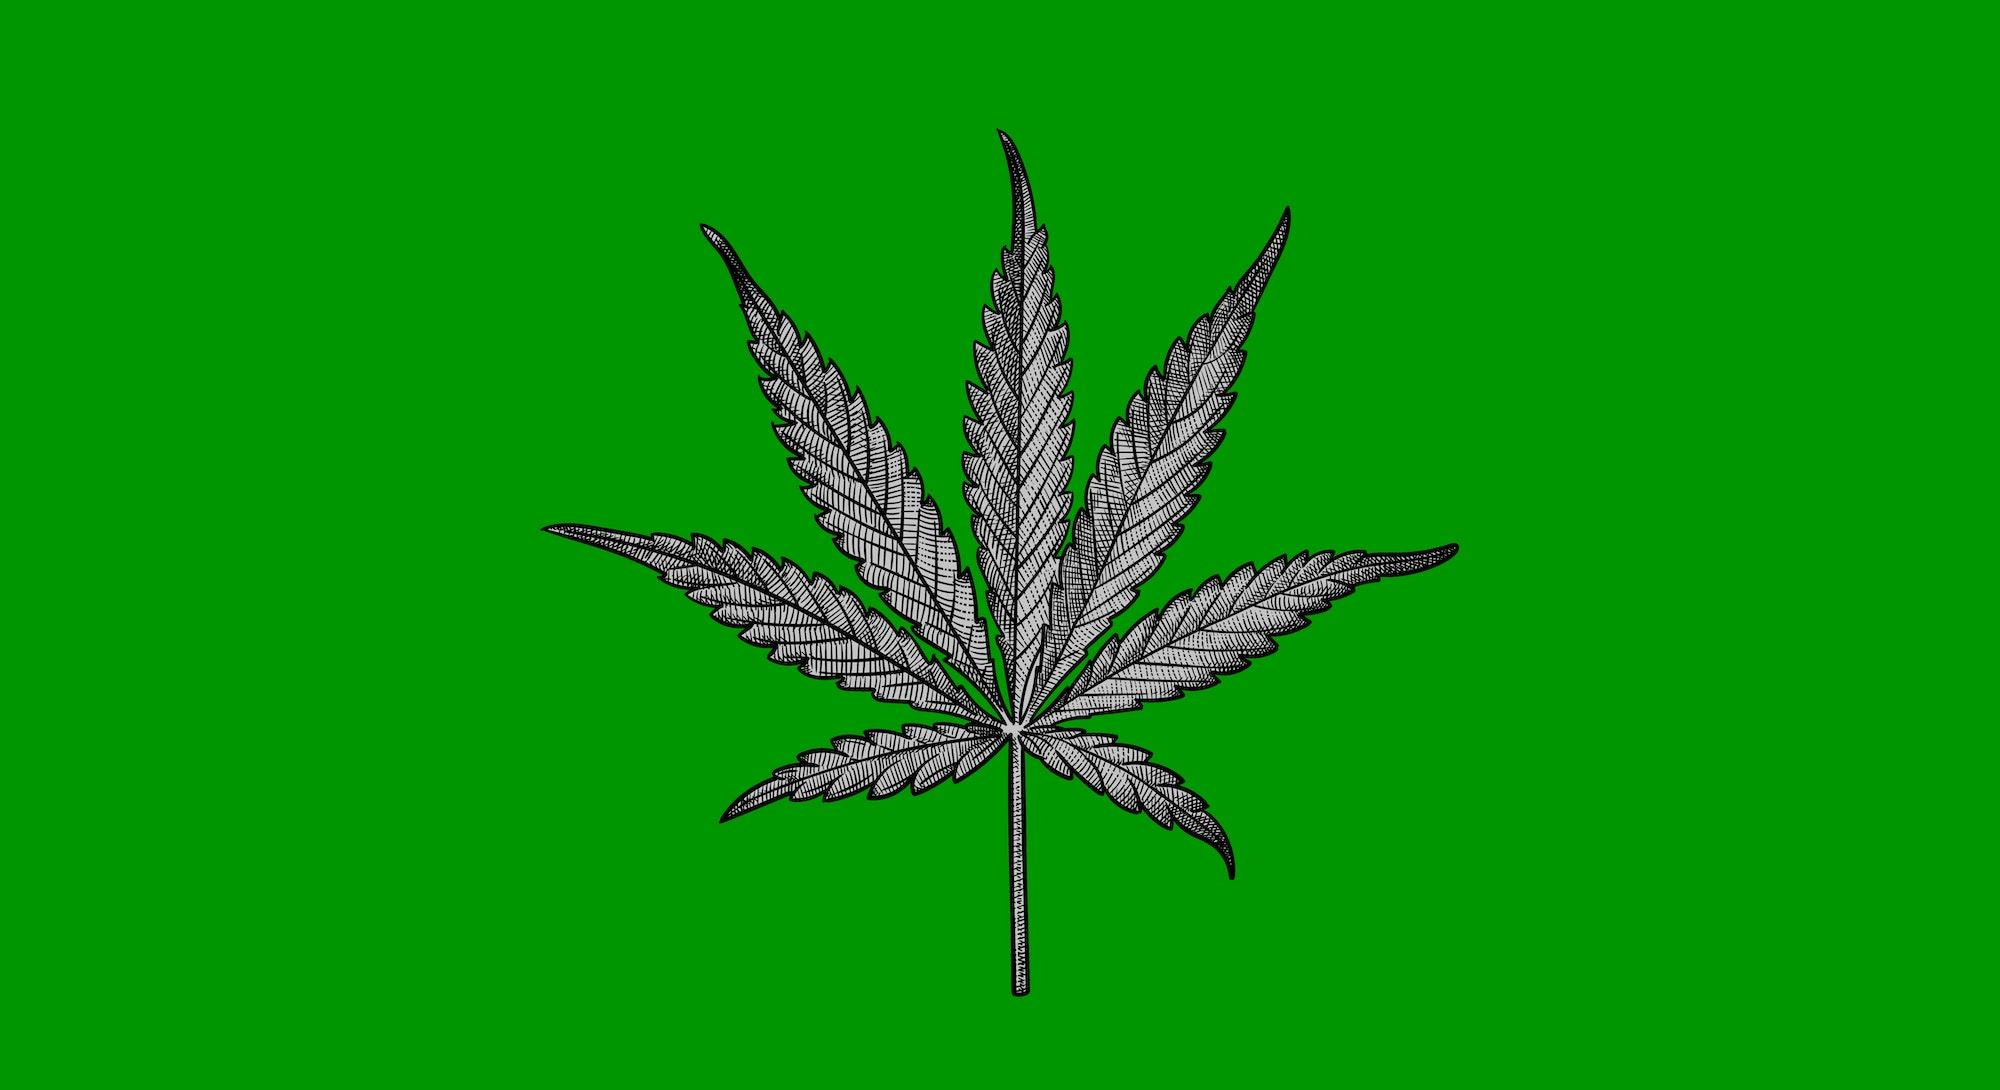 sketch of a marijuana leaf on a green backgroun